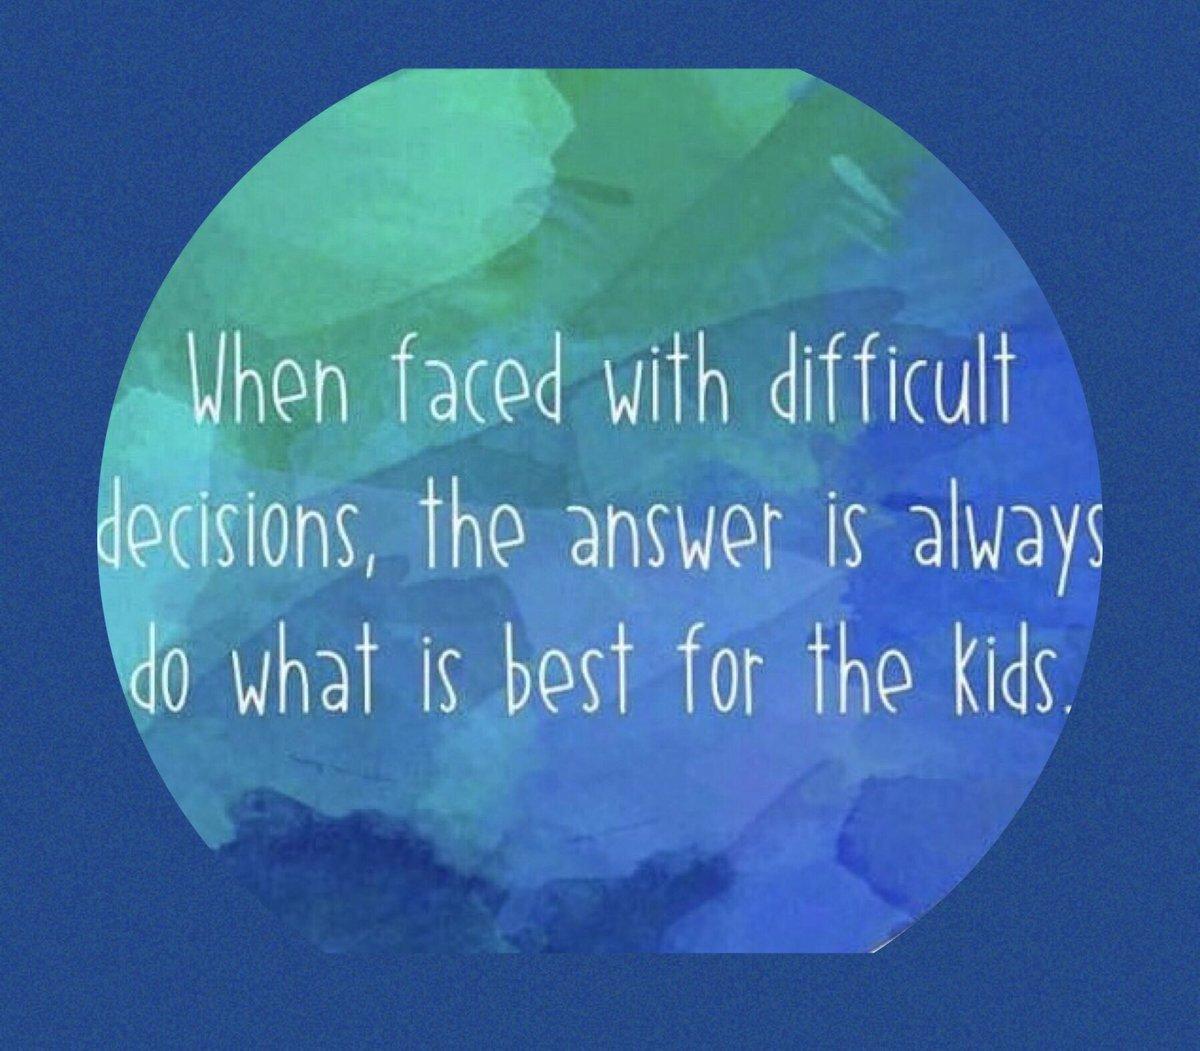 Truth. #HackingSchoolDiscipline #teachergoals